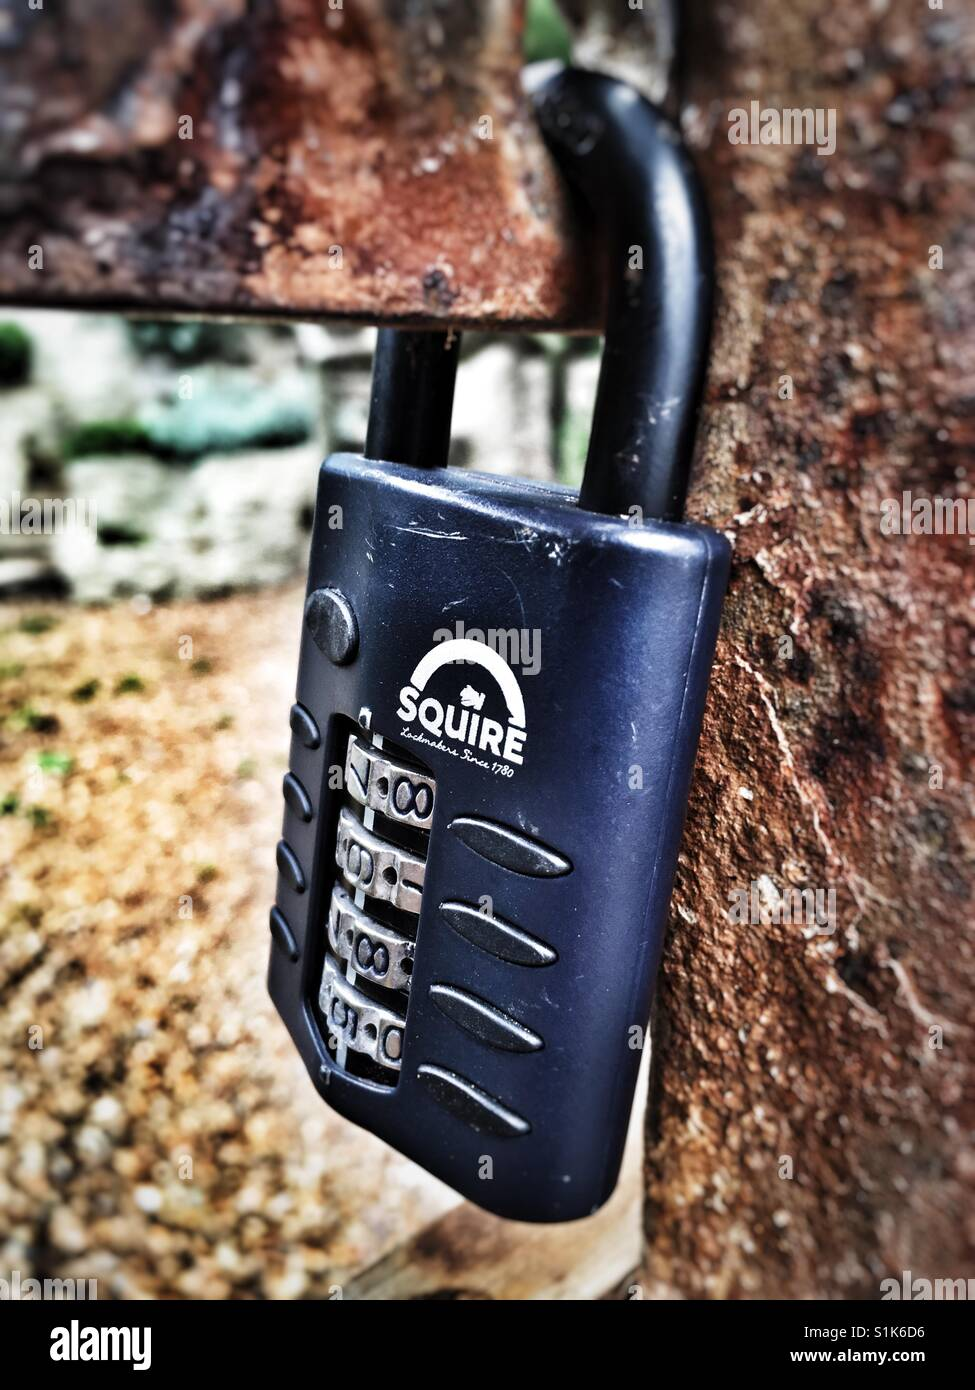 Squire combination padlock - Stock Image